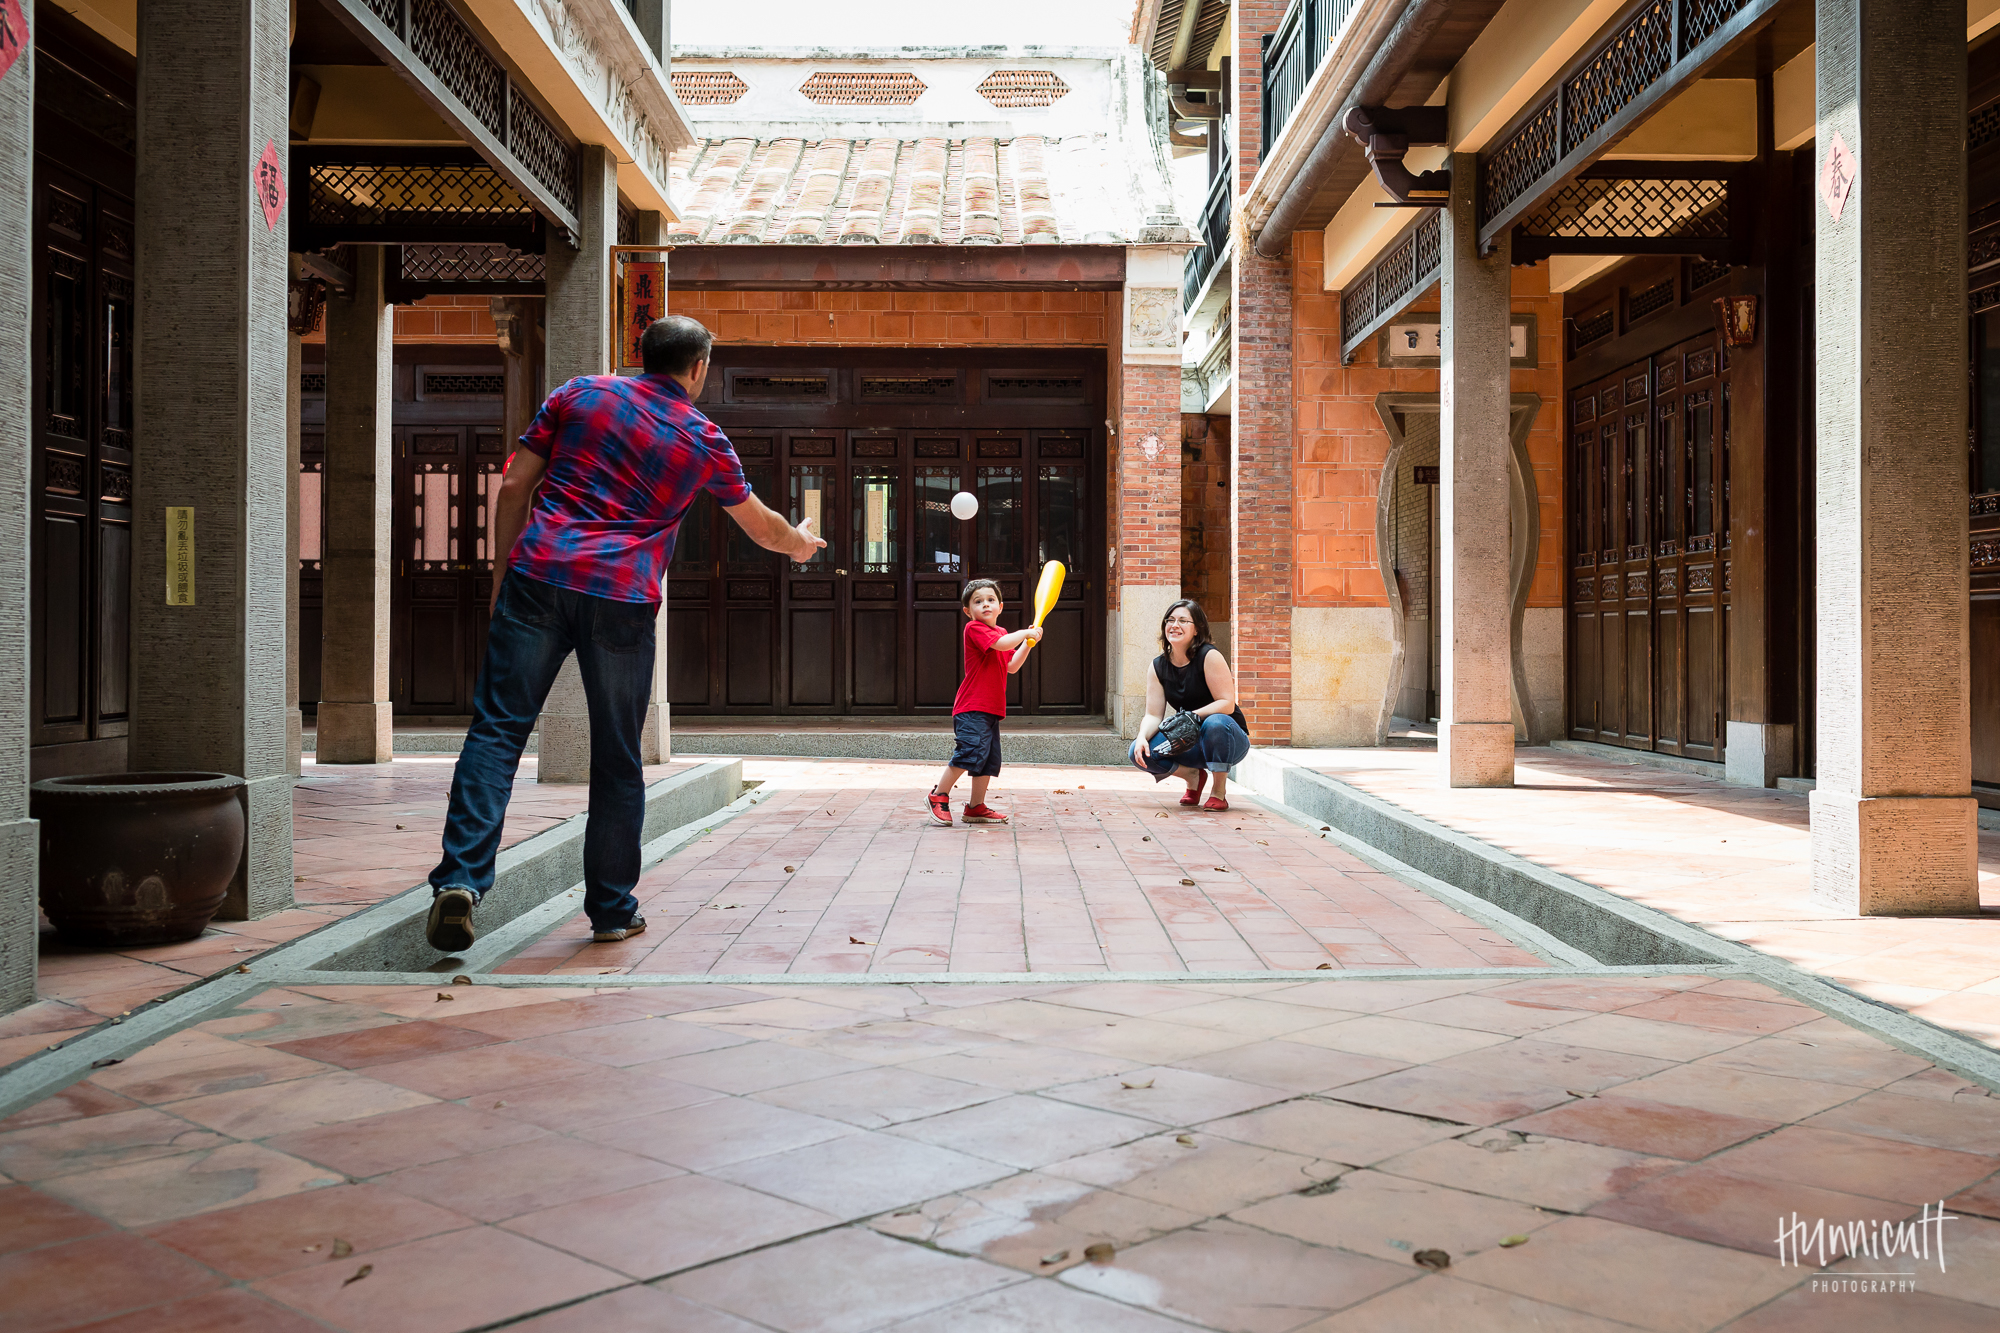 Family-Outdoor-Lifestyle-Modern-Urban-Travel-Culture-HunnicuttPhotography-RebeccaHunnicuttFarren-Taichung-Taiwan-9